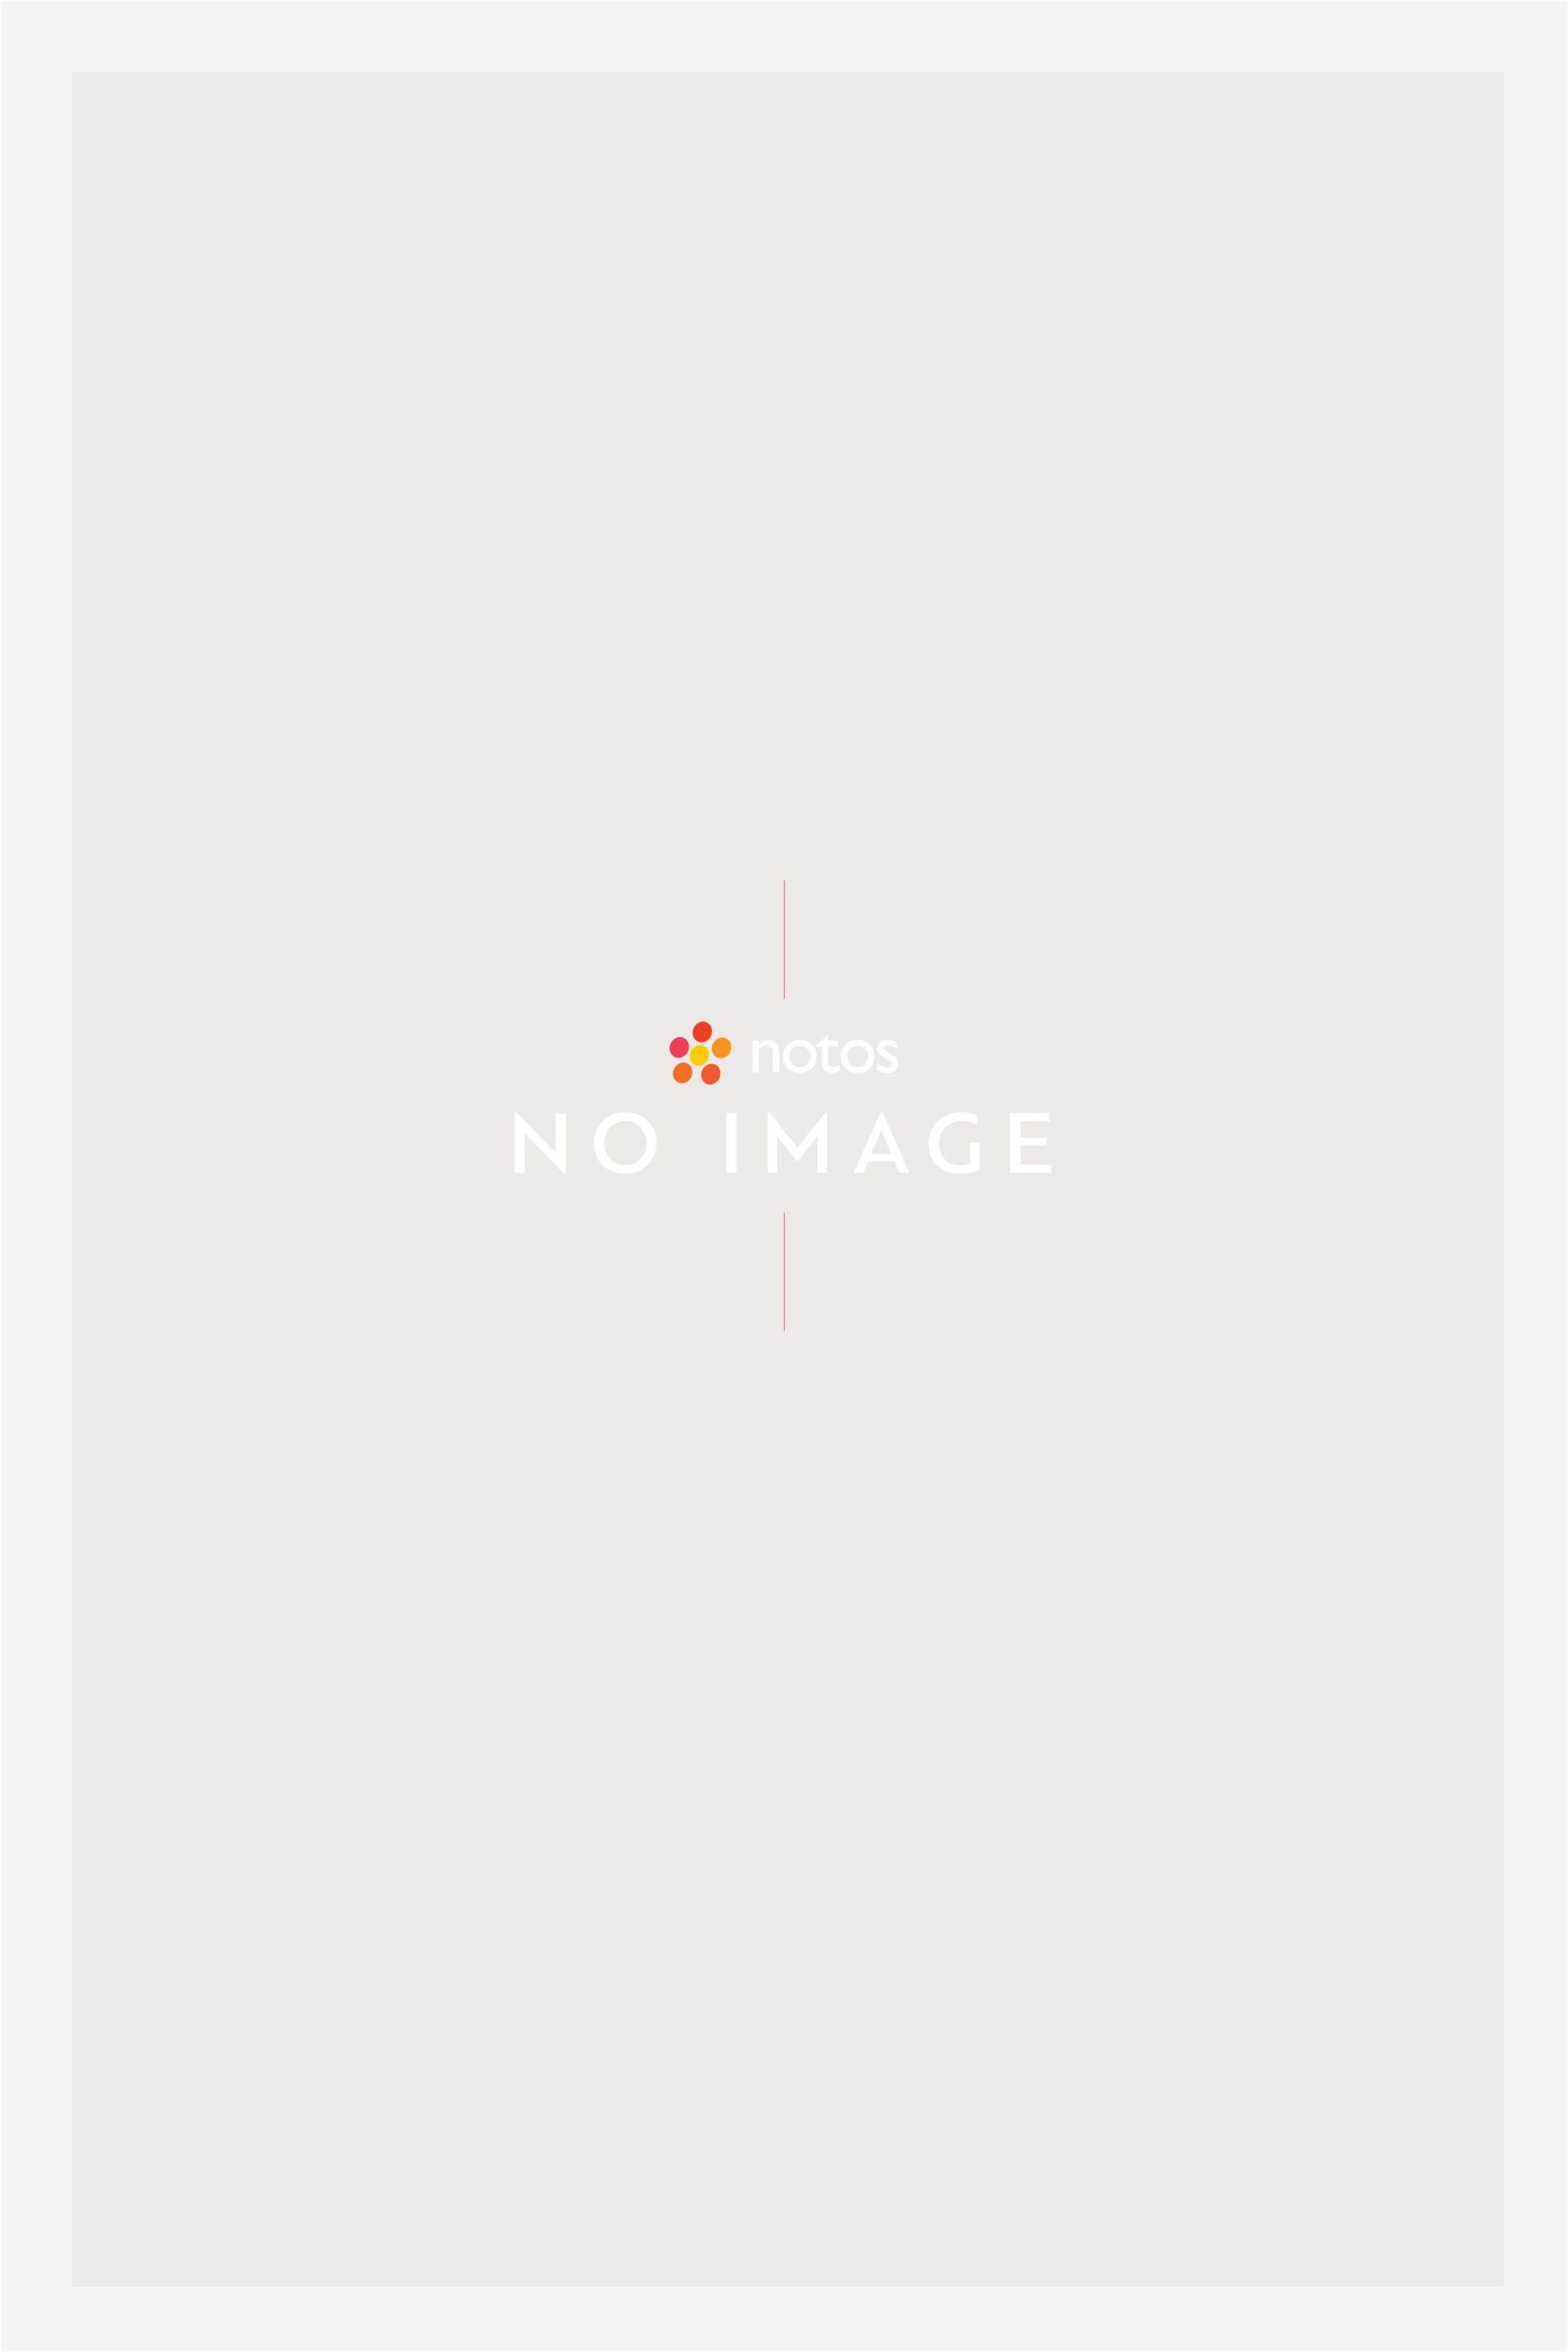 Lacoste ανδρική μπλούζα Polo L.12.12 με μακρύ μανίκι - L1312 - Ταμπά ανδρασ   ρουχα    νεεσ αφιξεισ   μπλούζες   πόλο